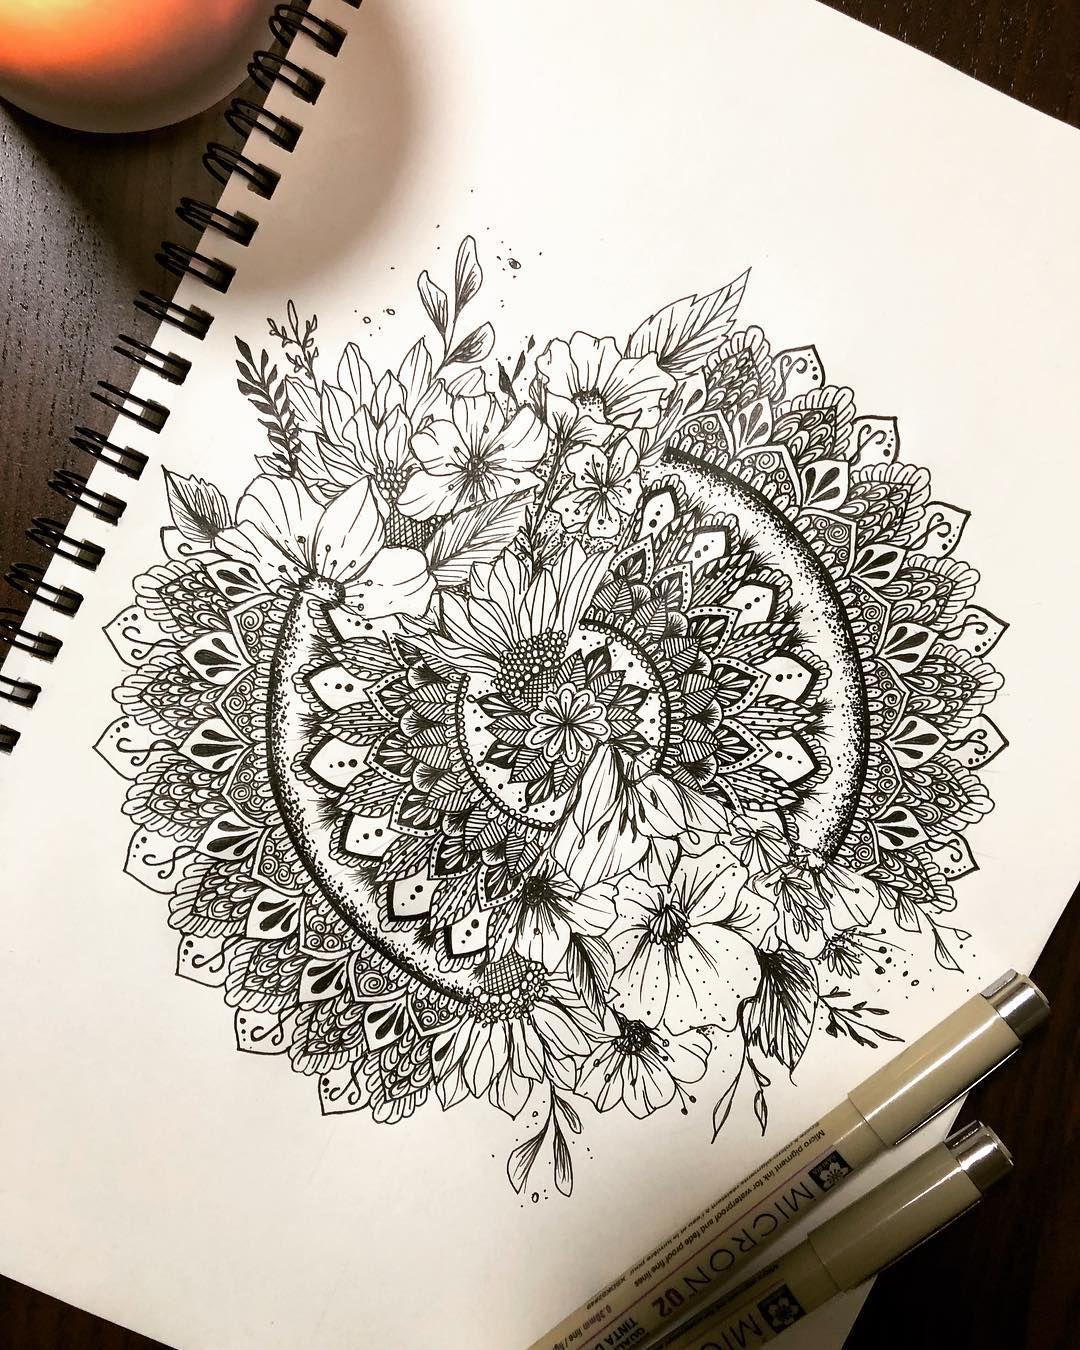 "Photo of ✨🦋 on Instagram: ""✨💫🌸🌼🌺 . . #mandala #zen #zentangle #flowers #drawing #mandalatattoo #tattoo #sketch #drawing #instagood #picoftheday #art #dibujo #flores…"""